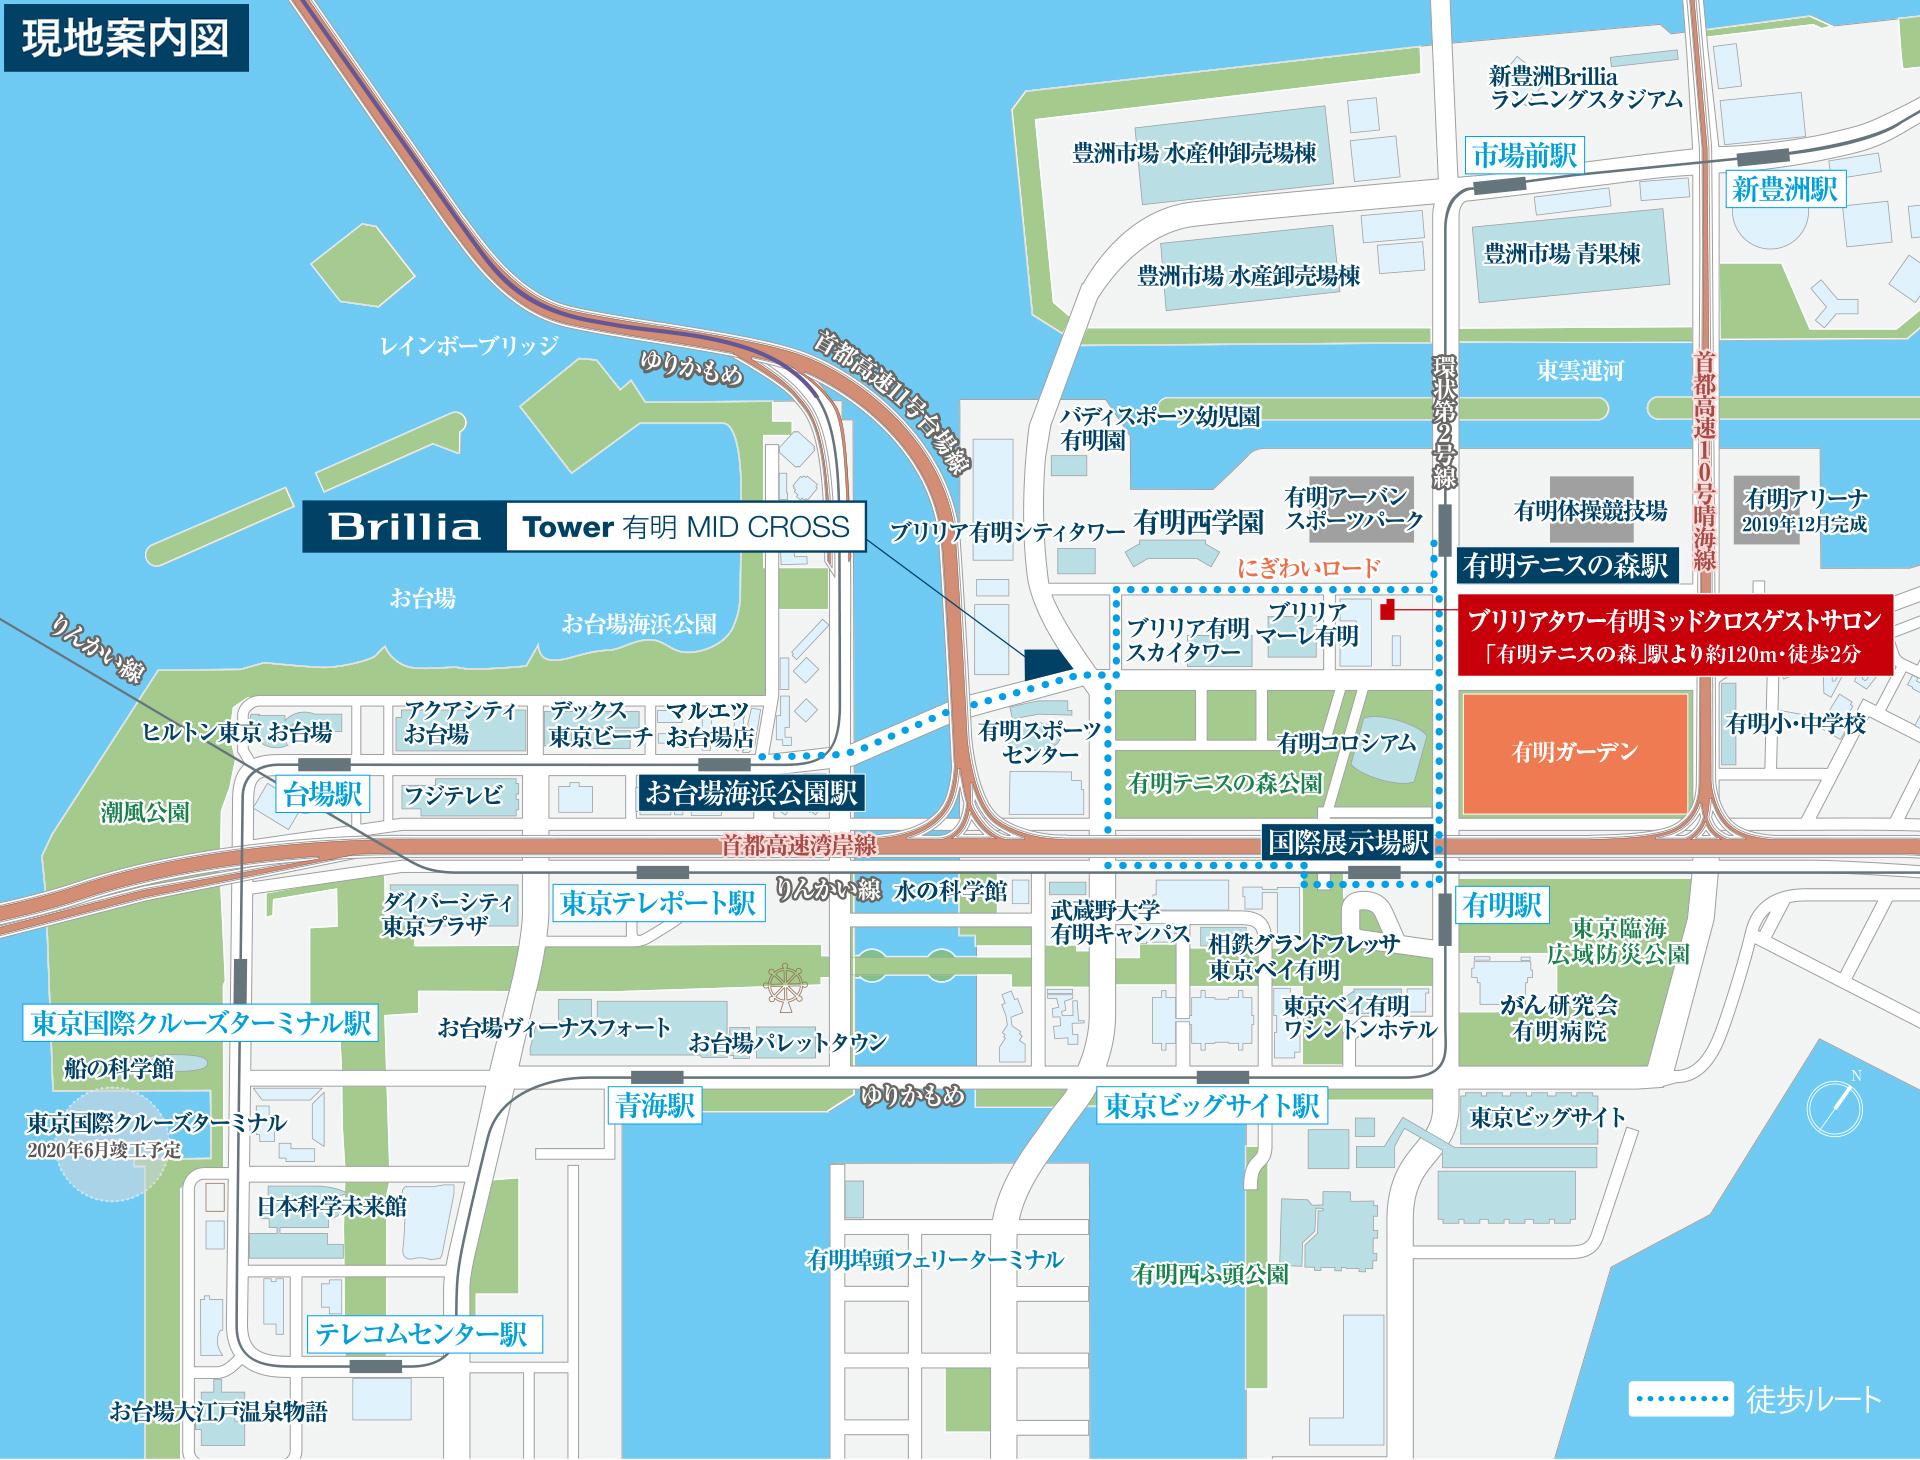 BTA map